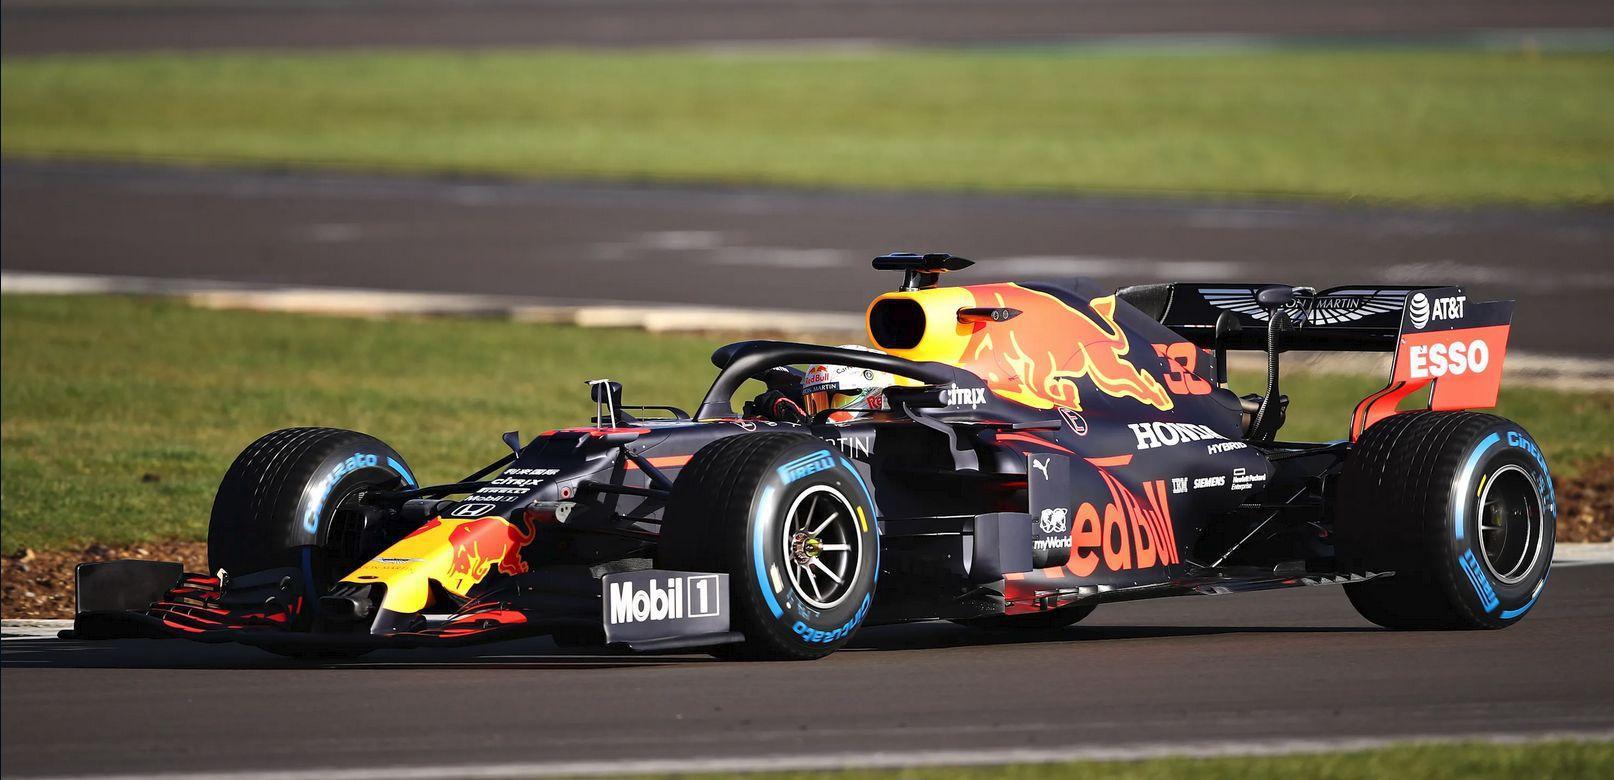 Red Bull F